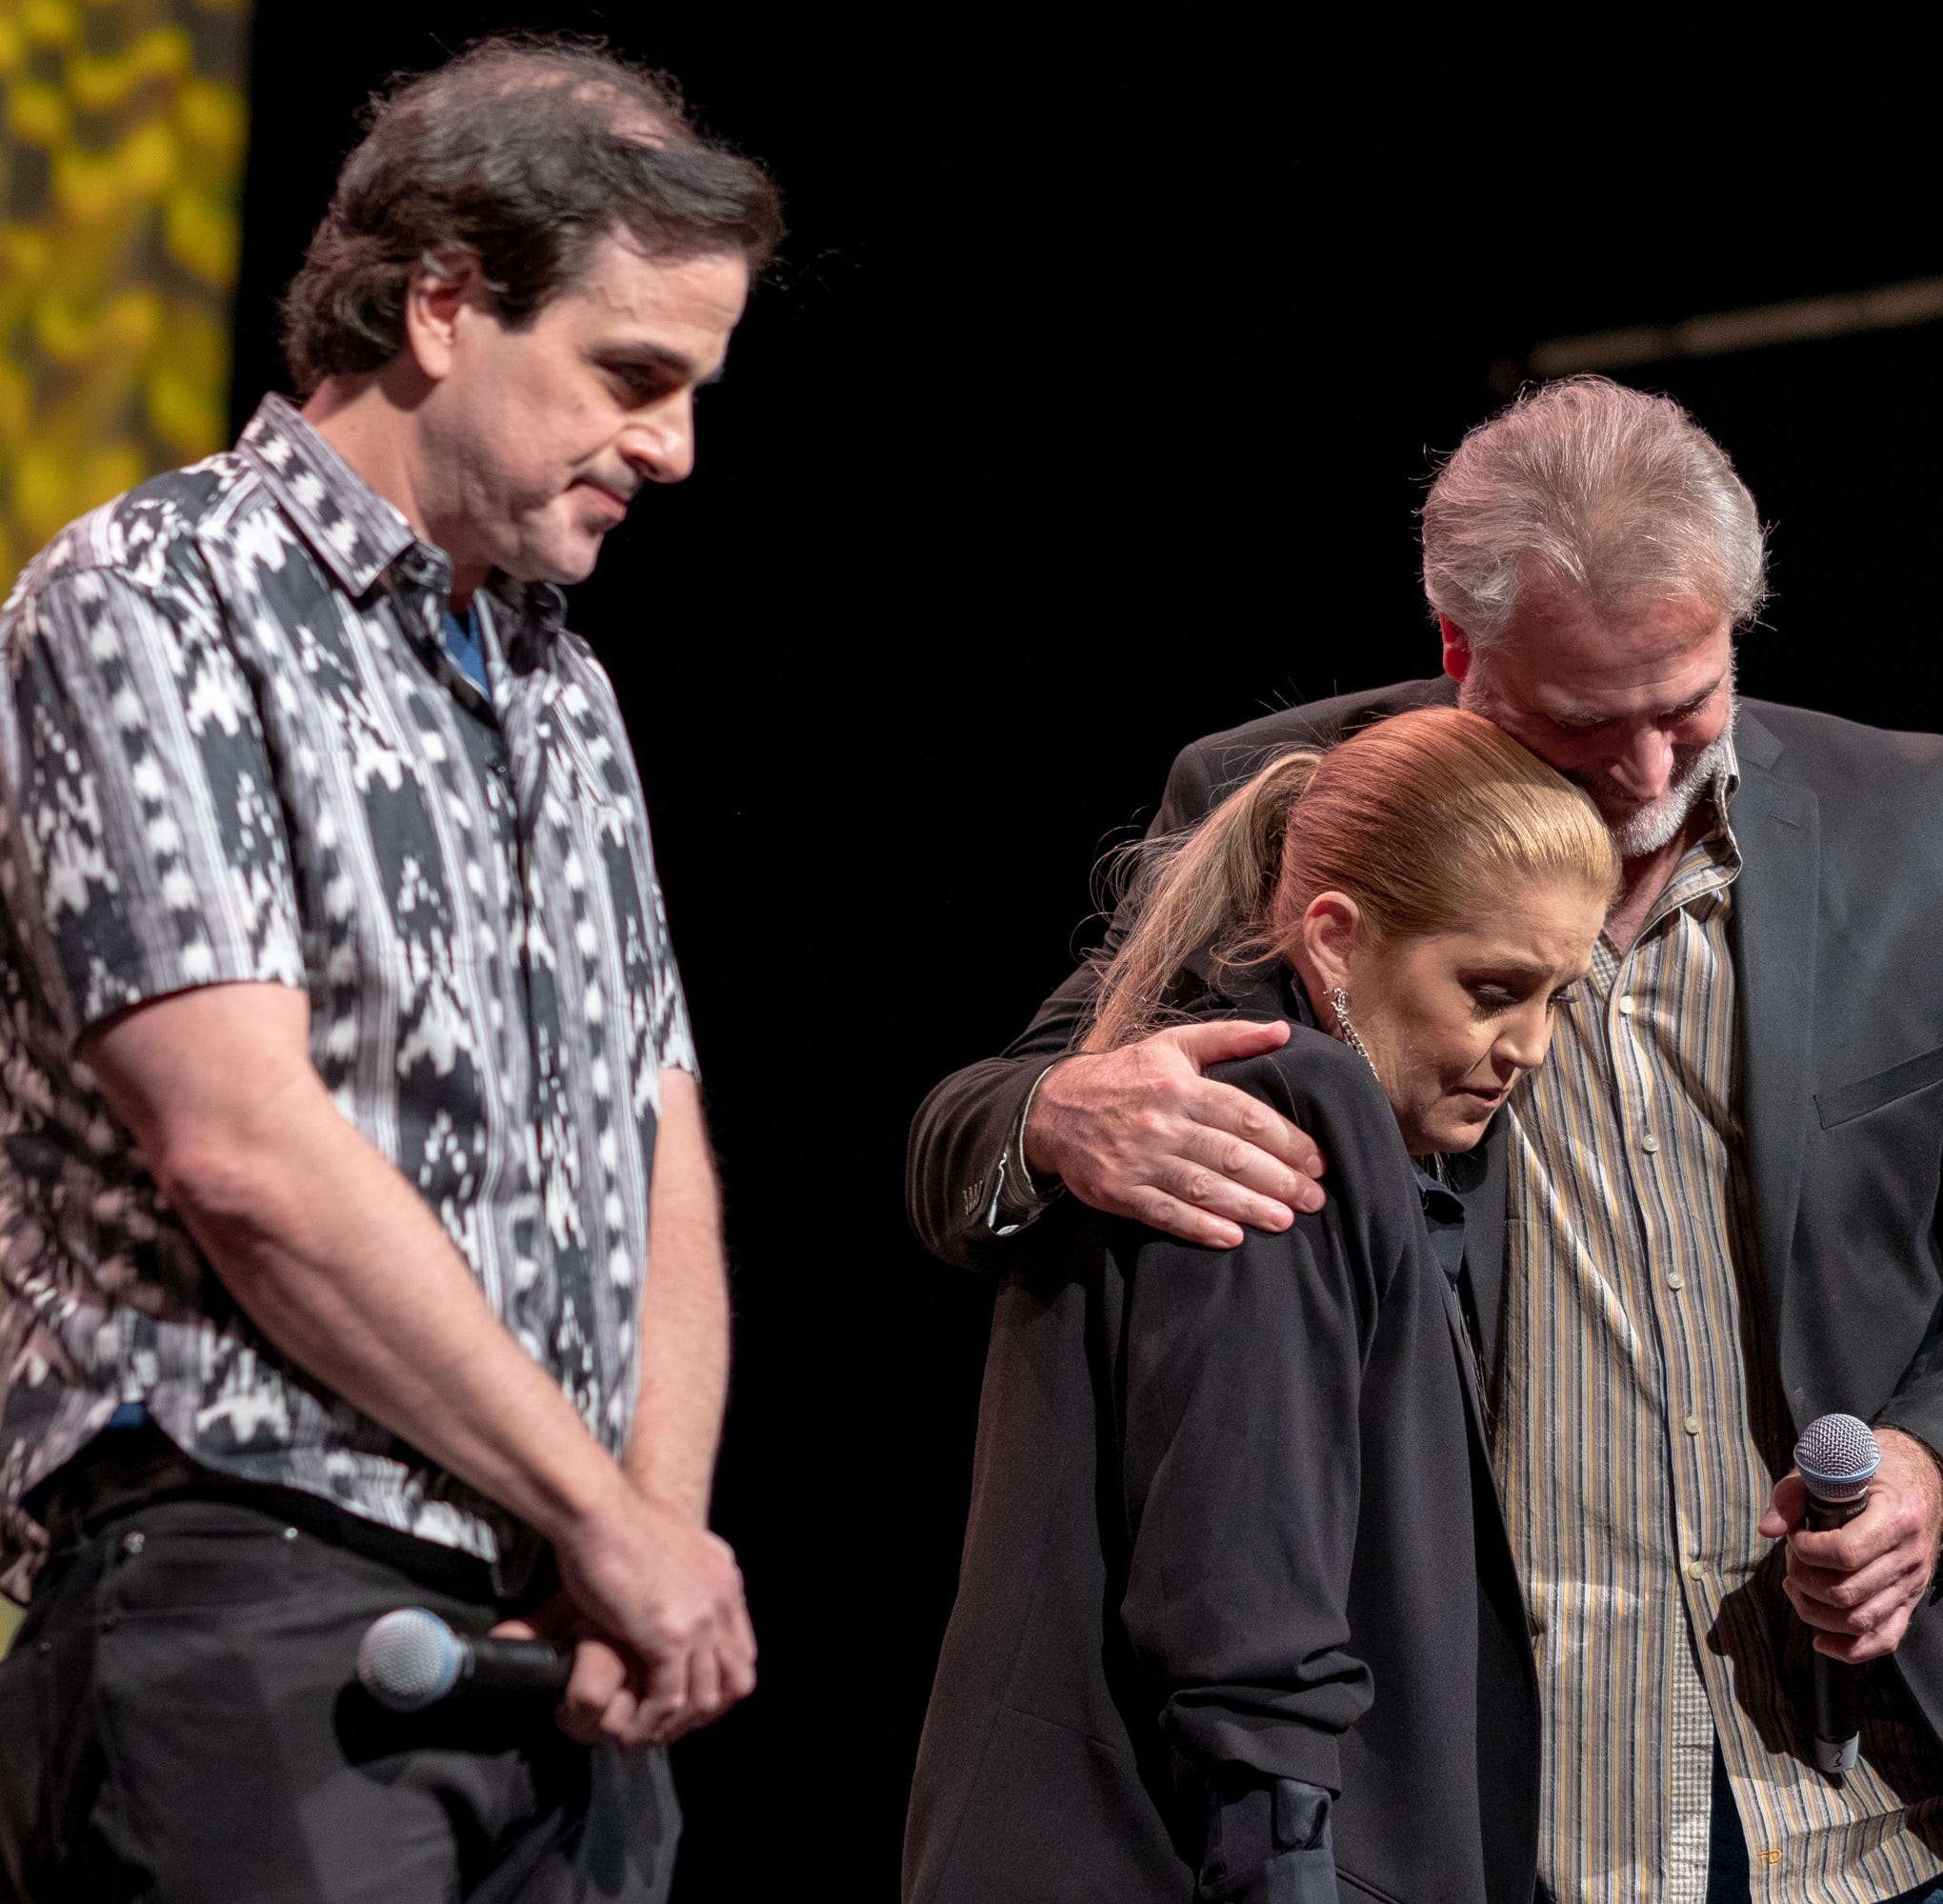 Elvis Week: Lisa Marie Presley talks candidly about personal struggles